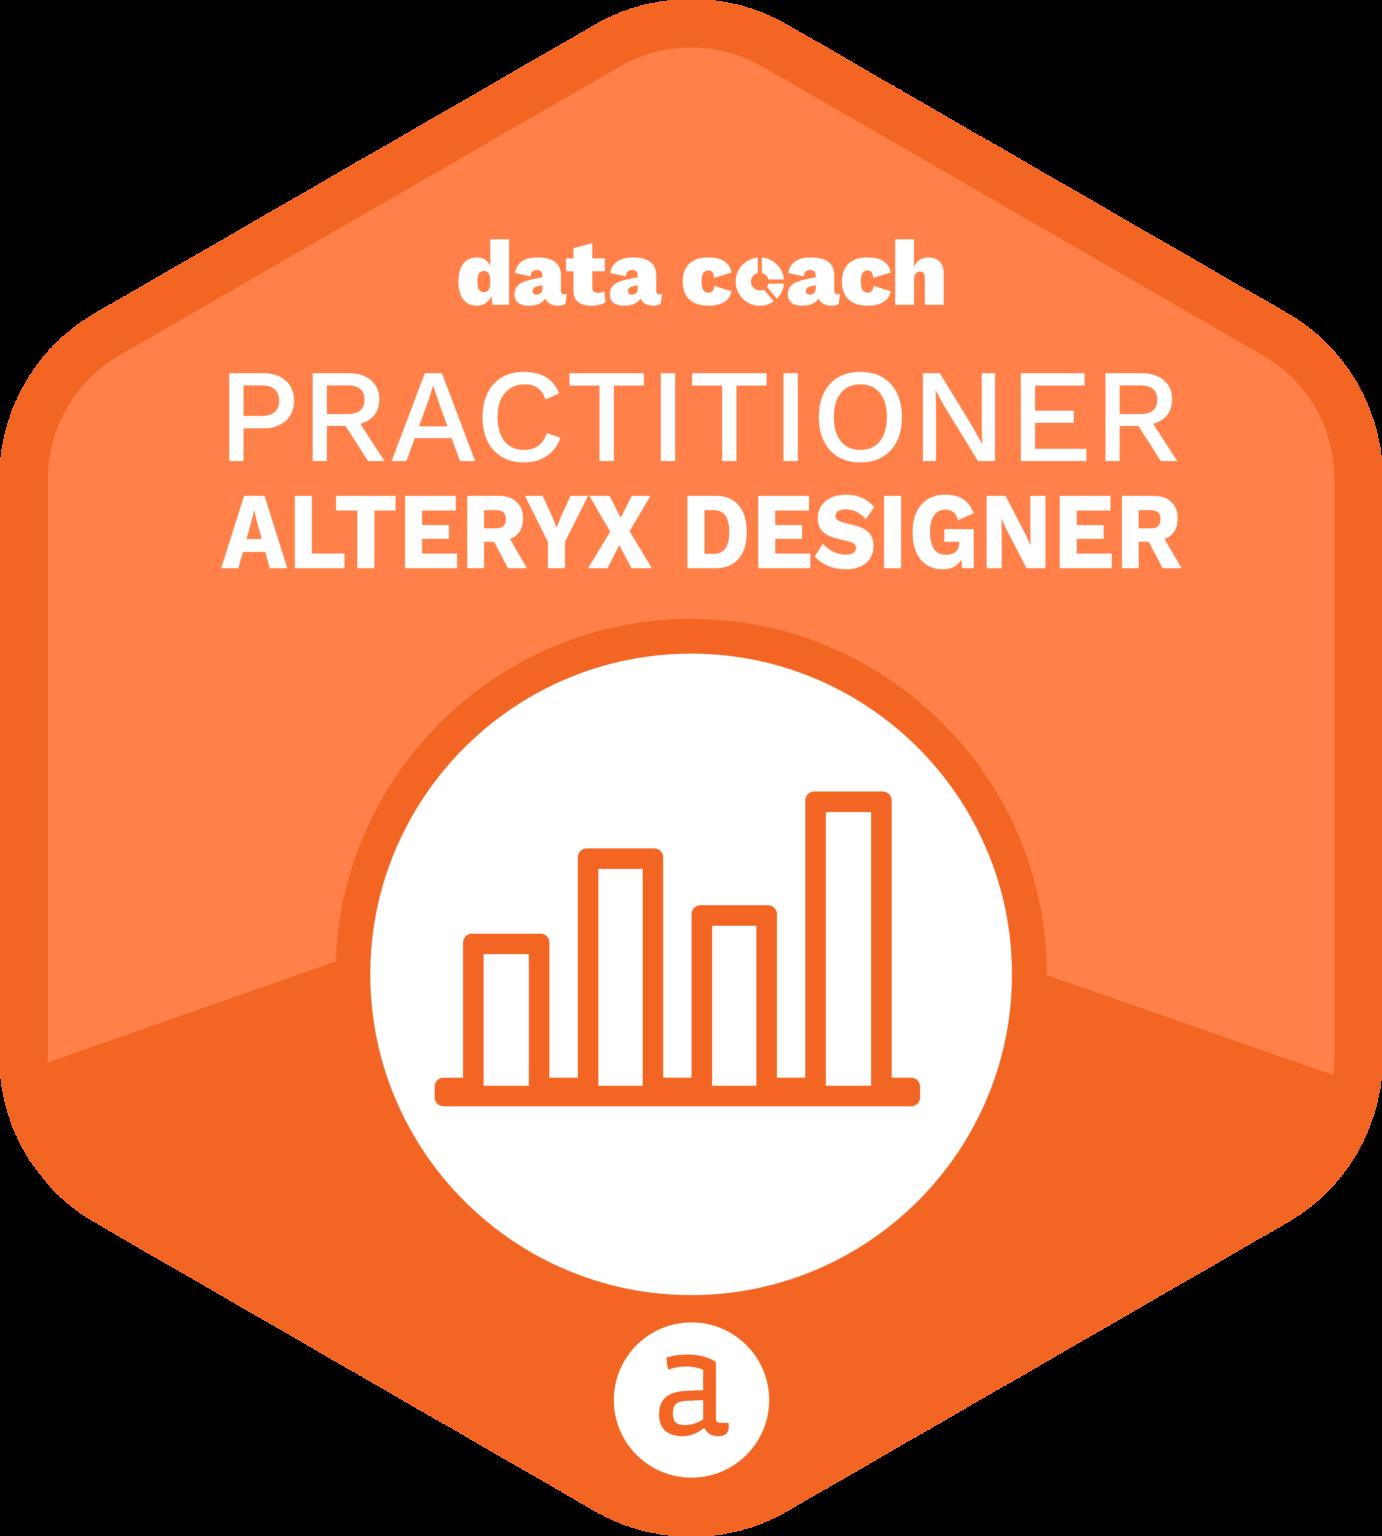 Alteryx-Designer-Practitioner-1382x1536